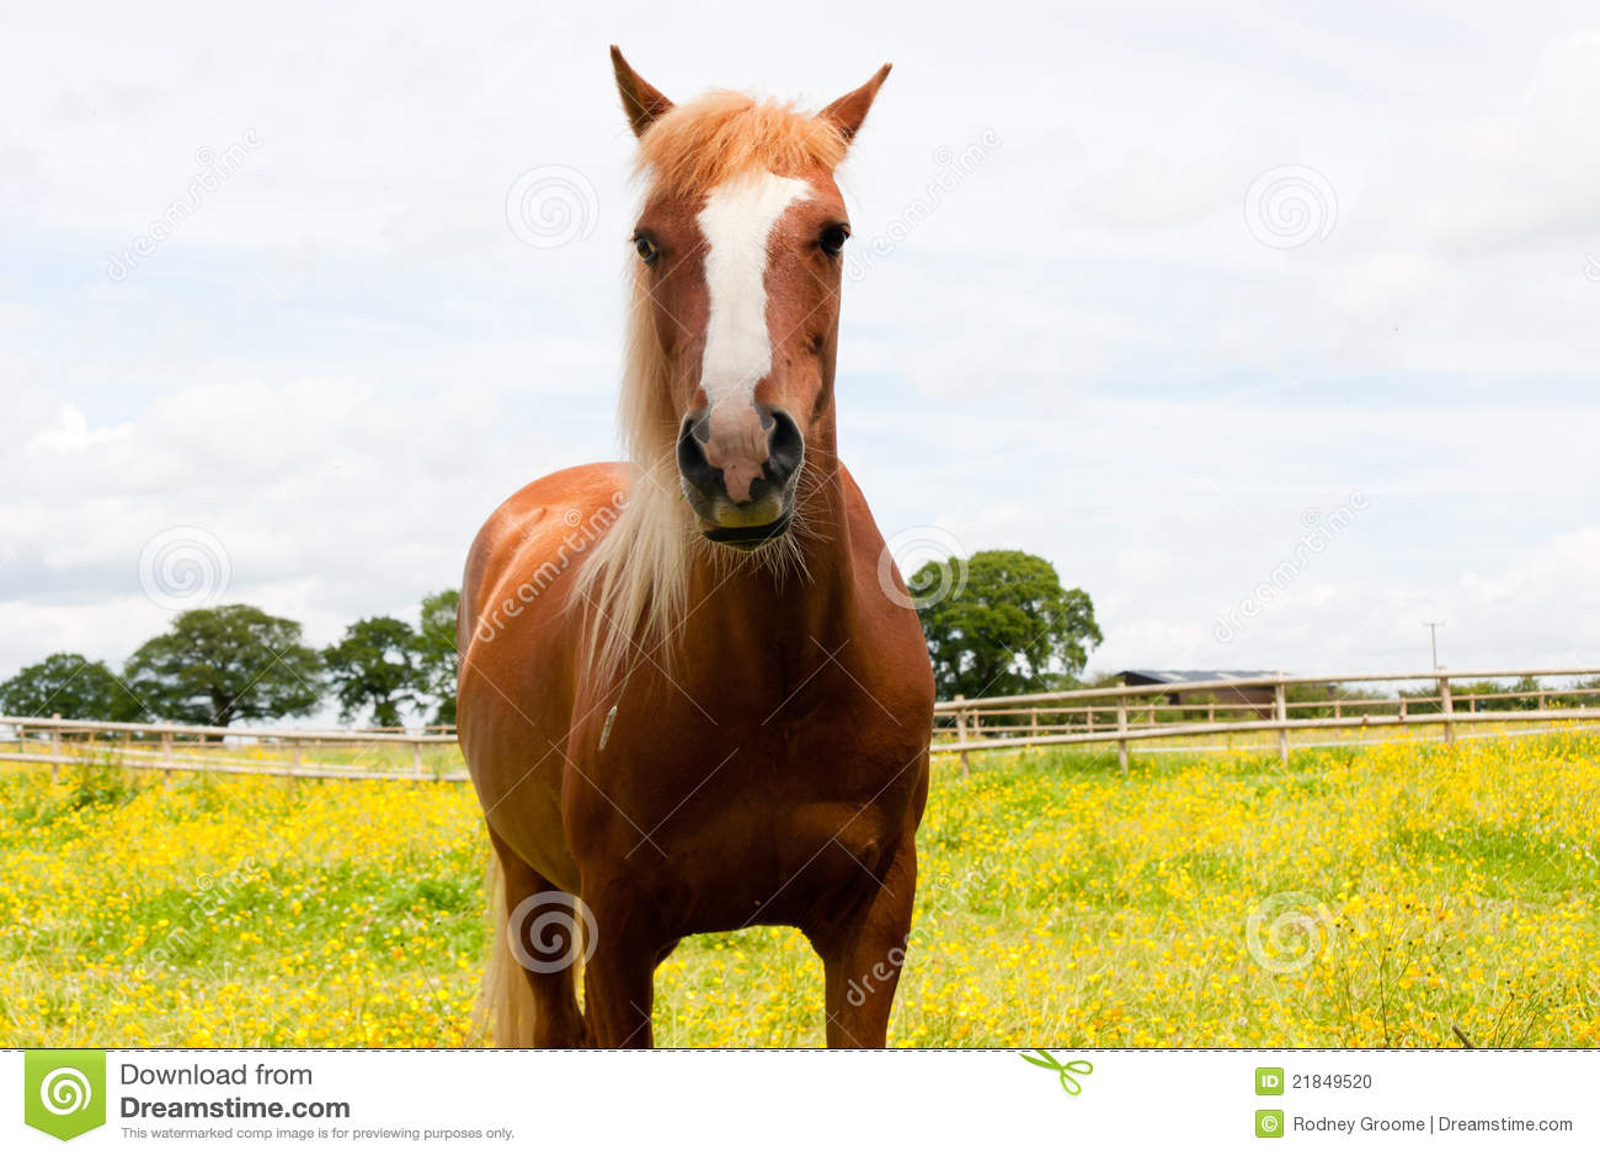 All pretty horses settings